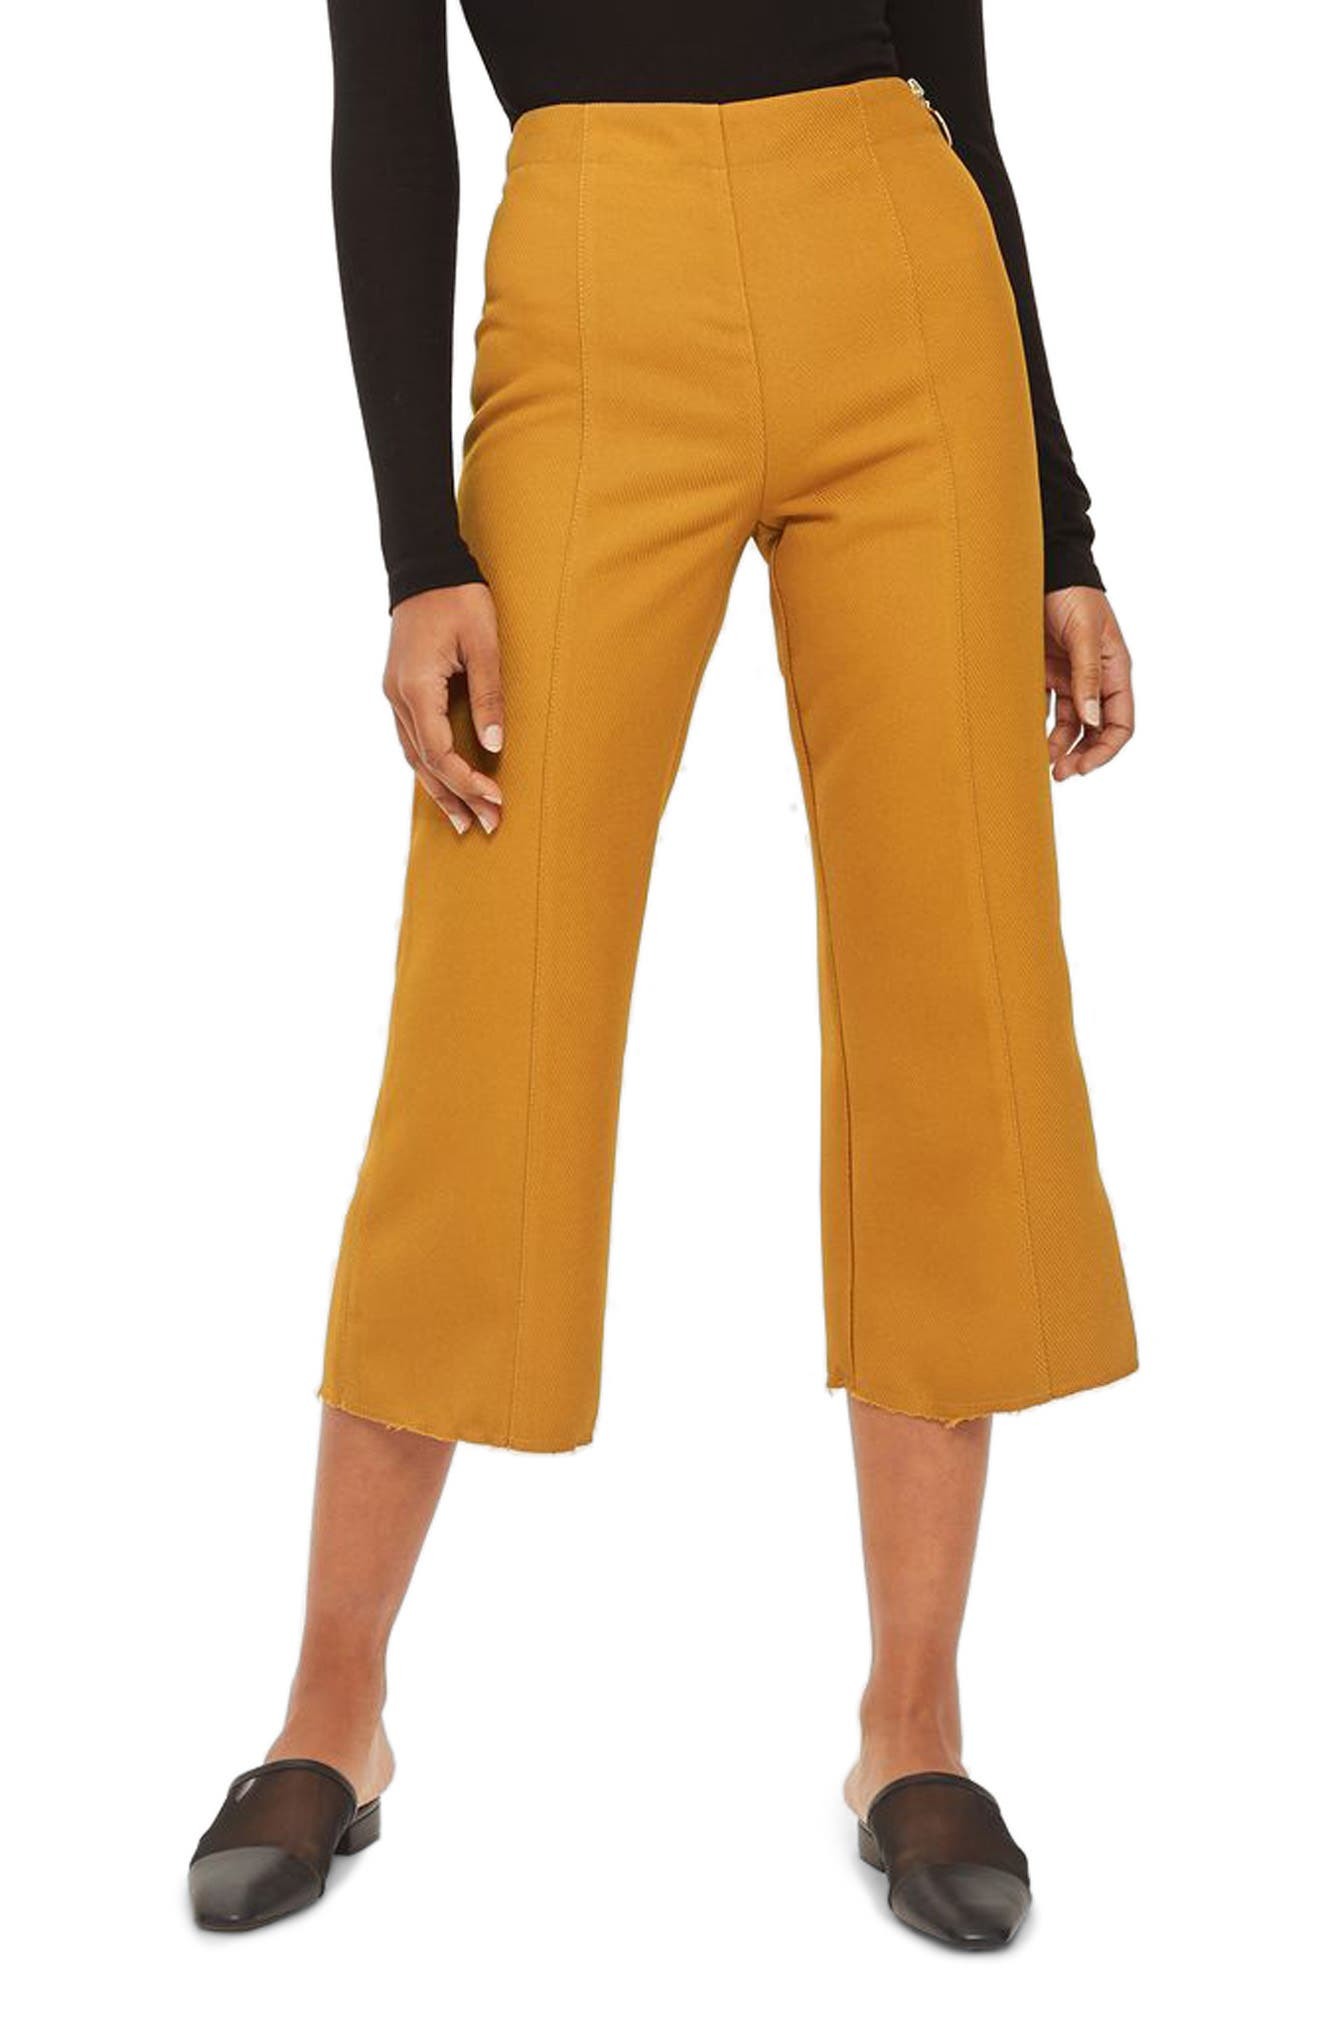 Main Image - Topshop Bonded Kick Flare Trousers